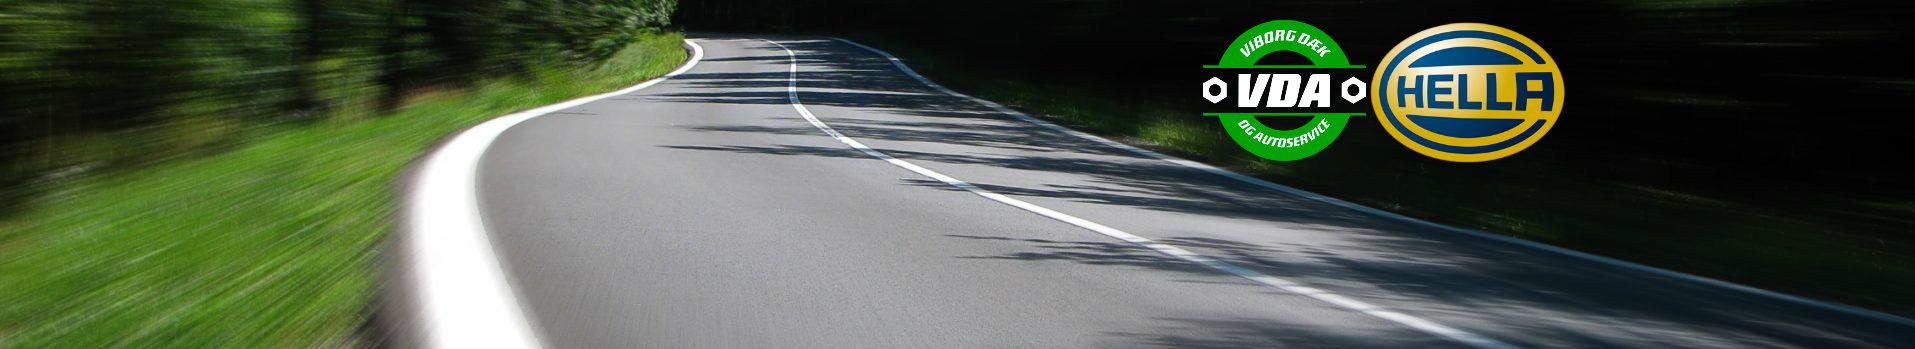 Viborg Dæk og Autoservice